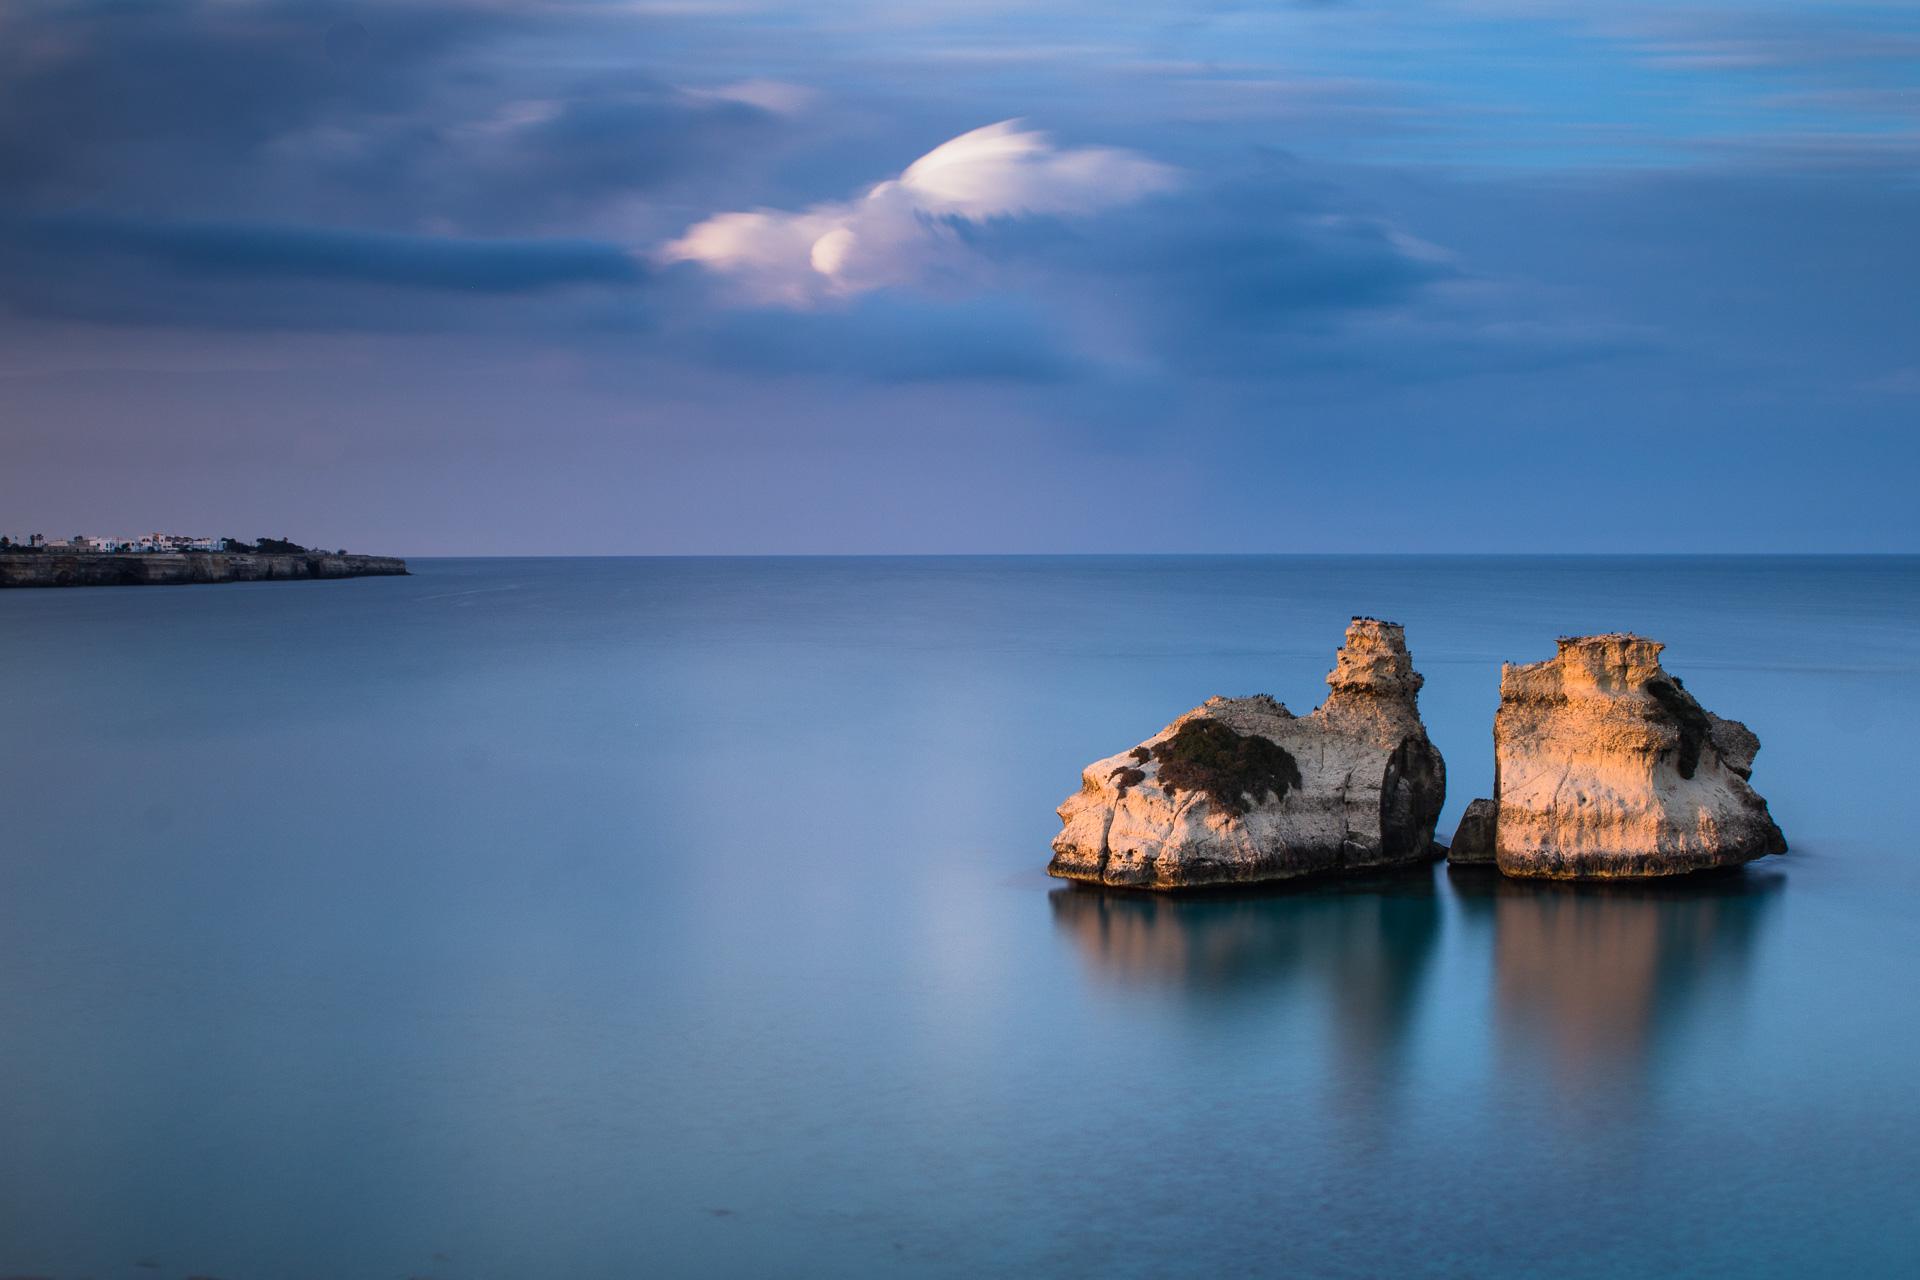 Le Due Sorelle Torre dell'Orso, seascape long exposure photography